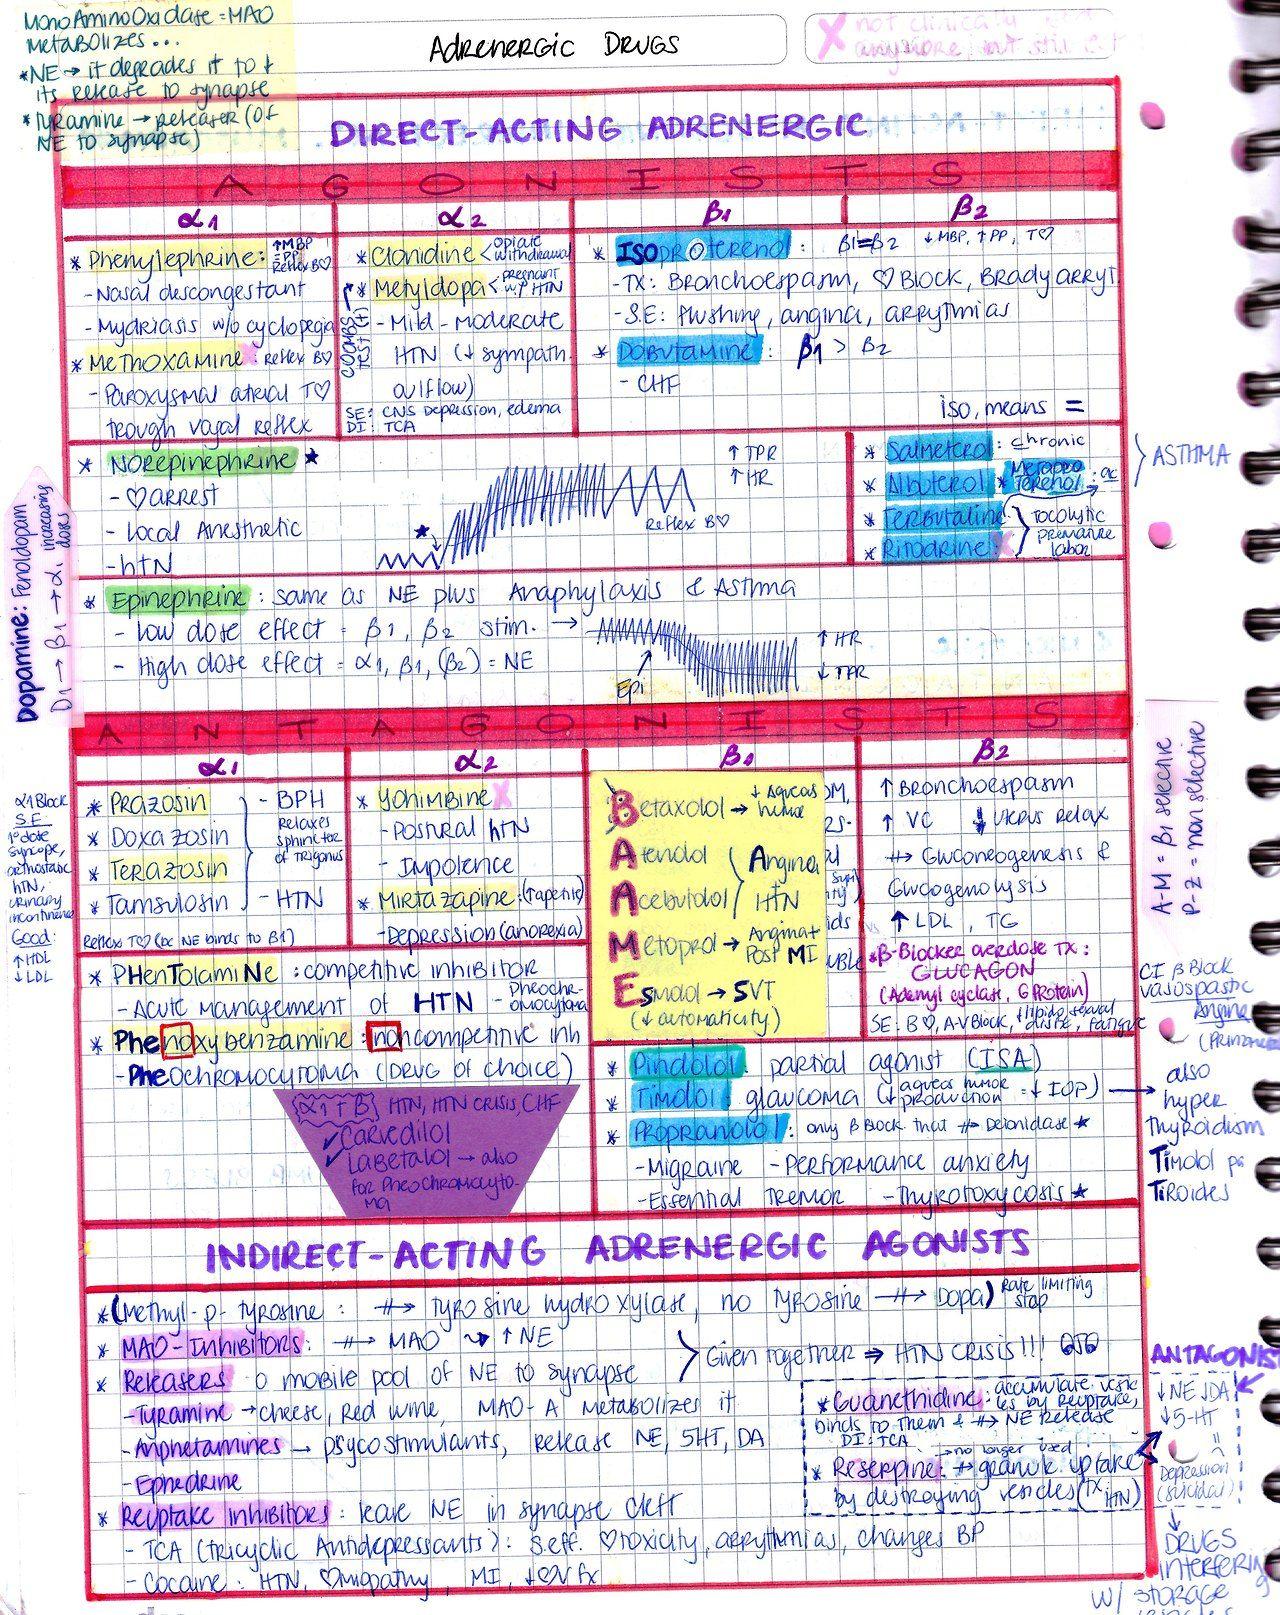 My Notes for USMLE | Study Motivation | Pharmacology nursing, Family